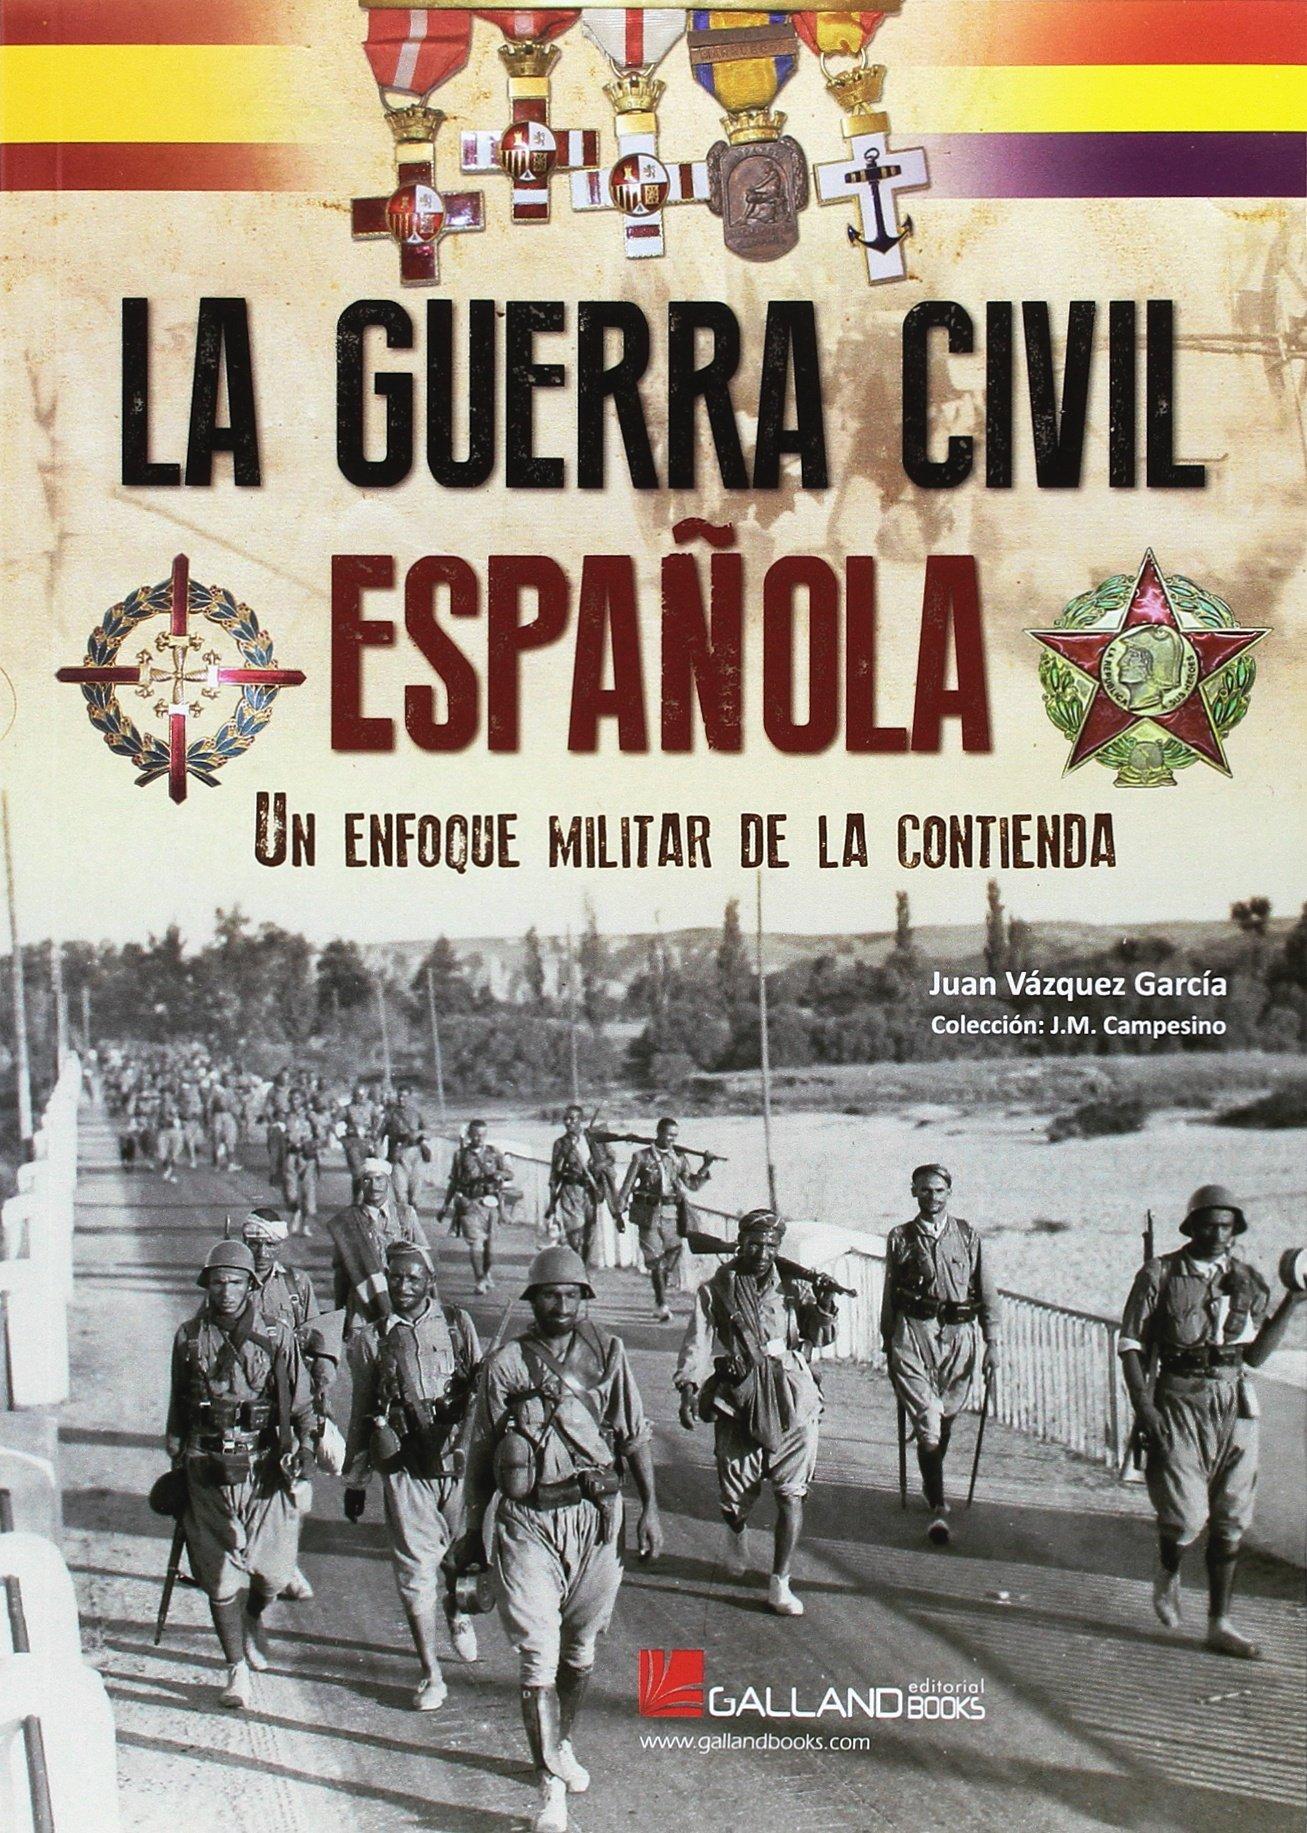 La Guerra Civil Española: Amazon.es: Juan Vázquez García: Libros